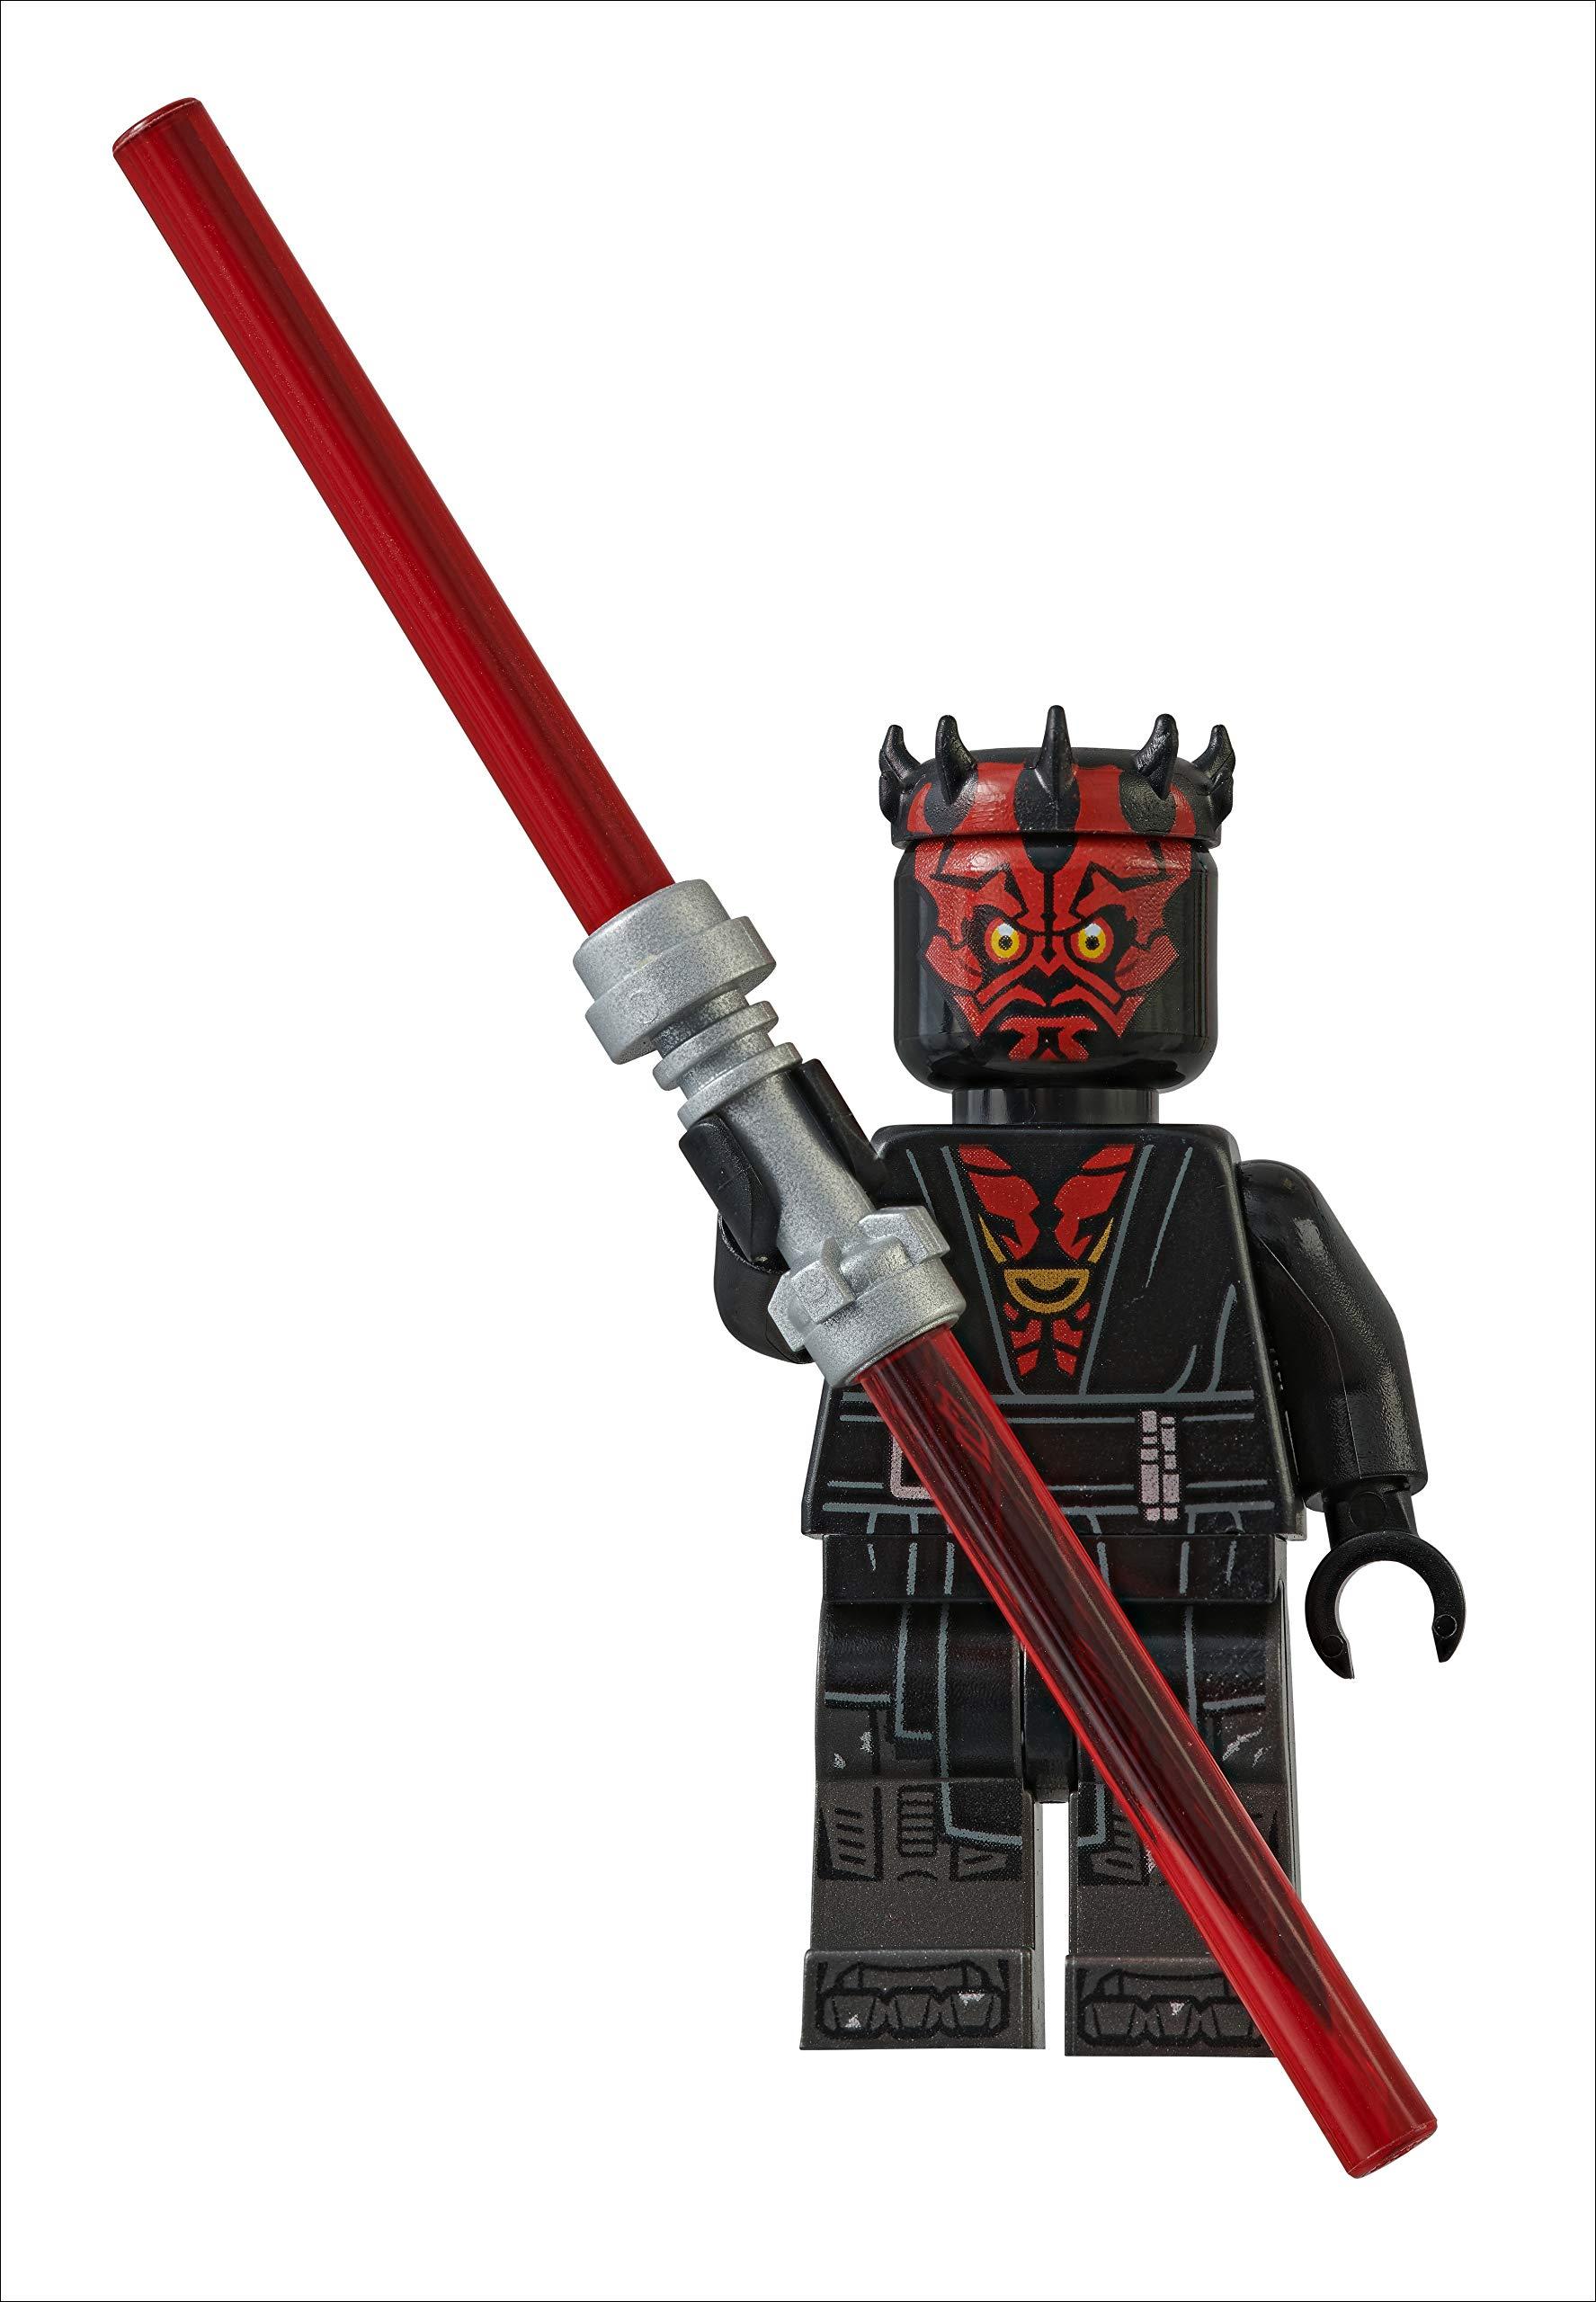 Star Wars DARTH VADER Custom Brick Lego Compatible Mini Figure UK shipping!